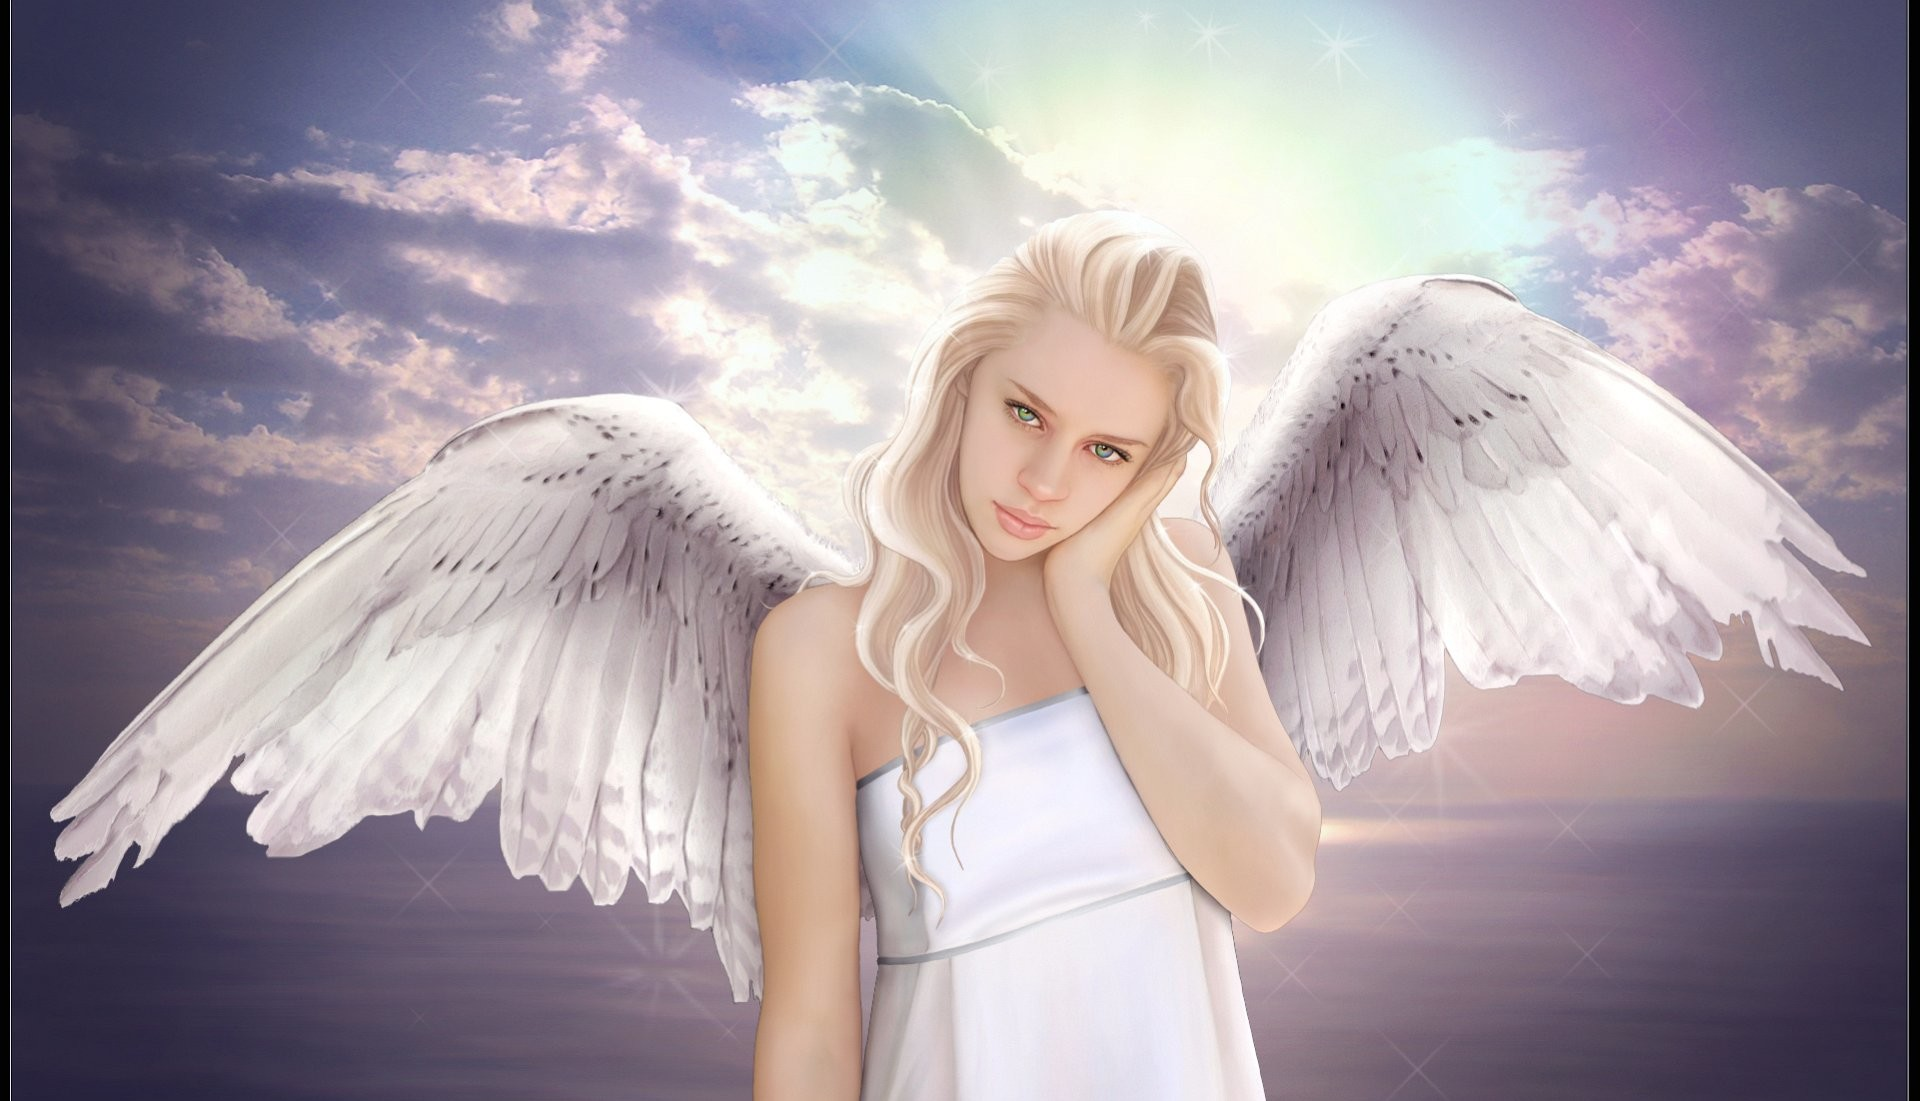 Res: 1920x1101, ... wallpaper-blonde-angel-fantasy.jpg ...